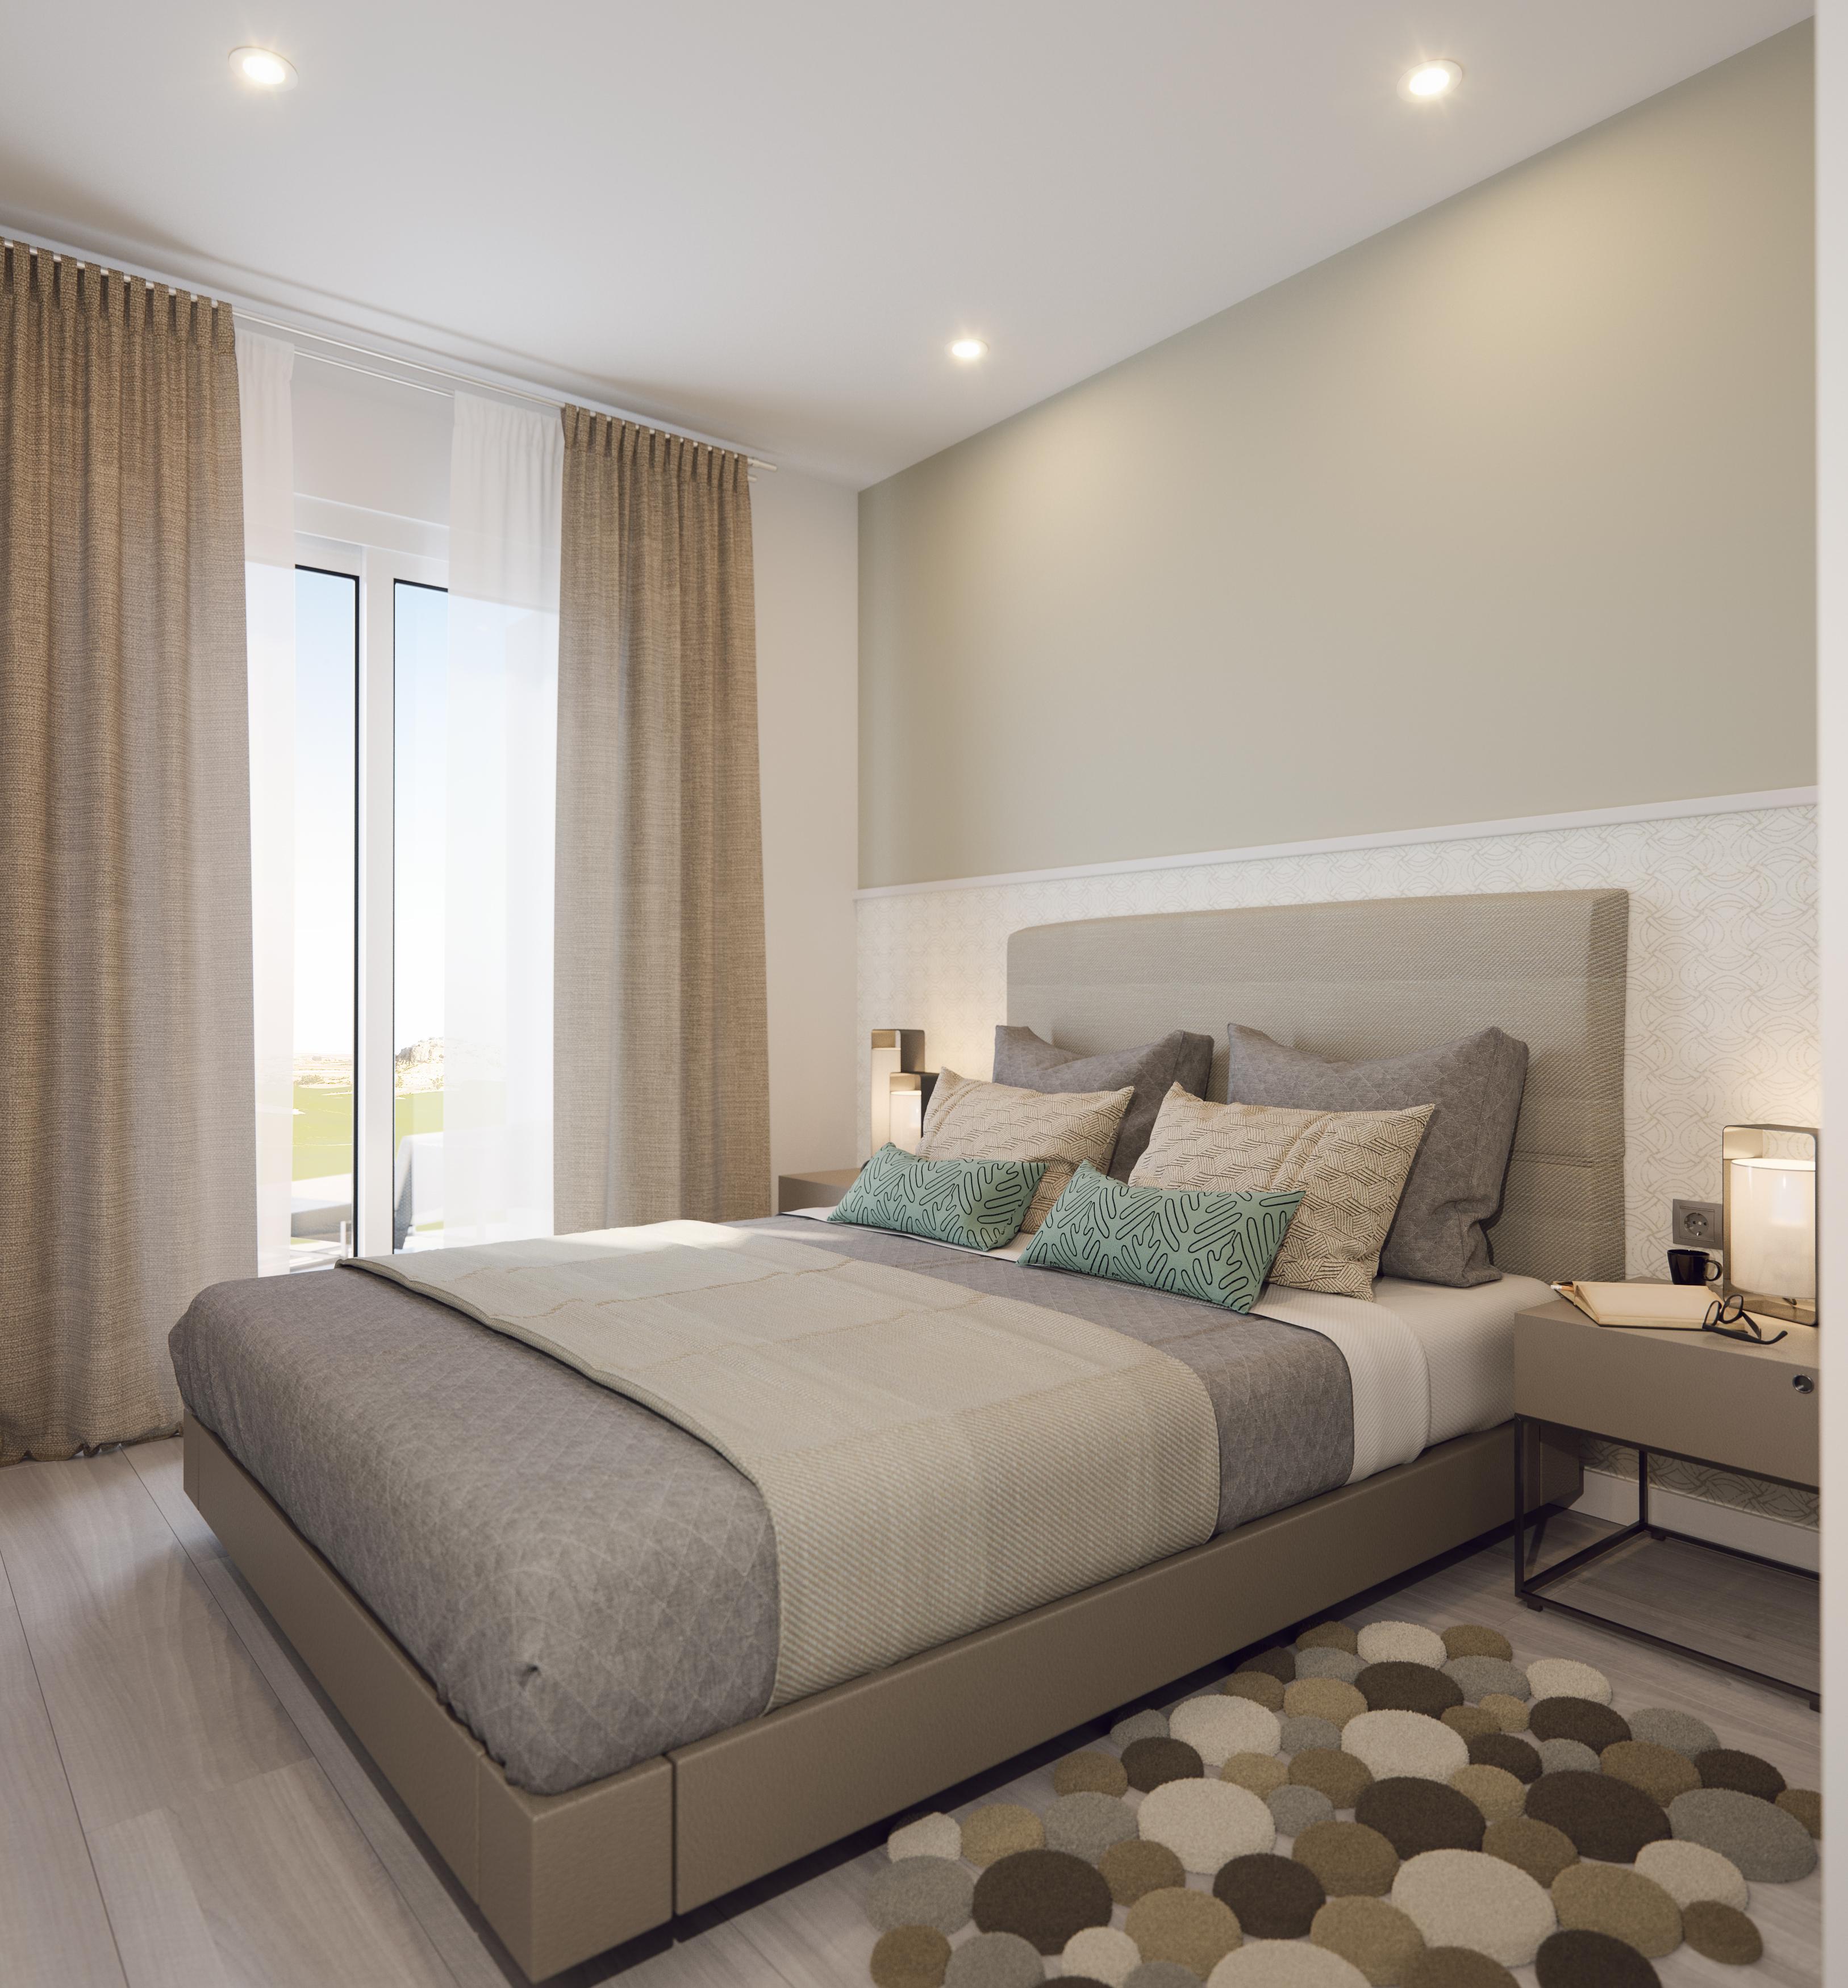 2 bedroom apartment For Sale in Roldan - photograph 6